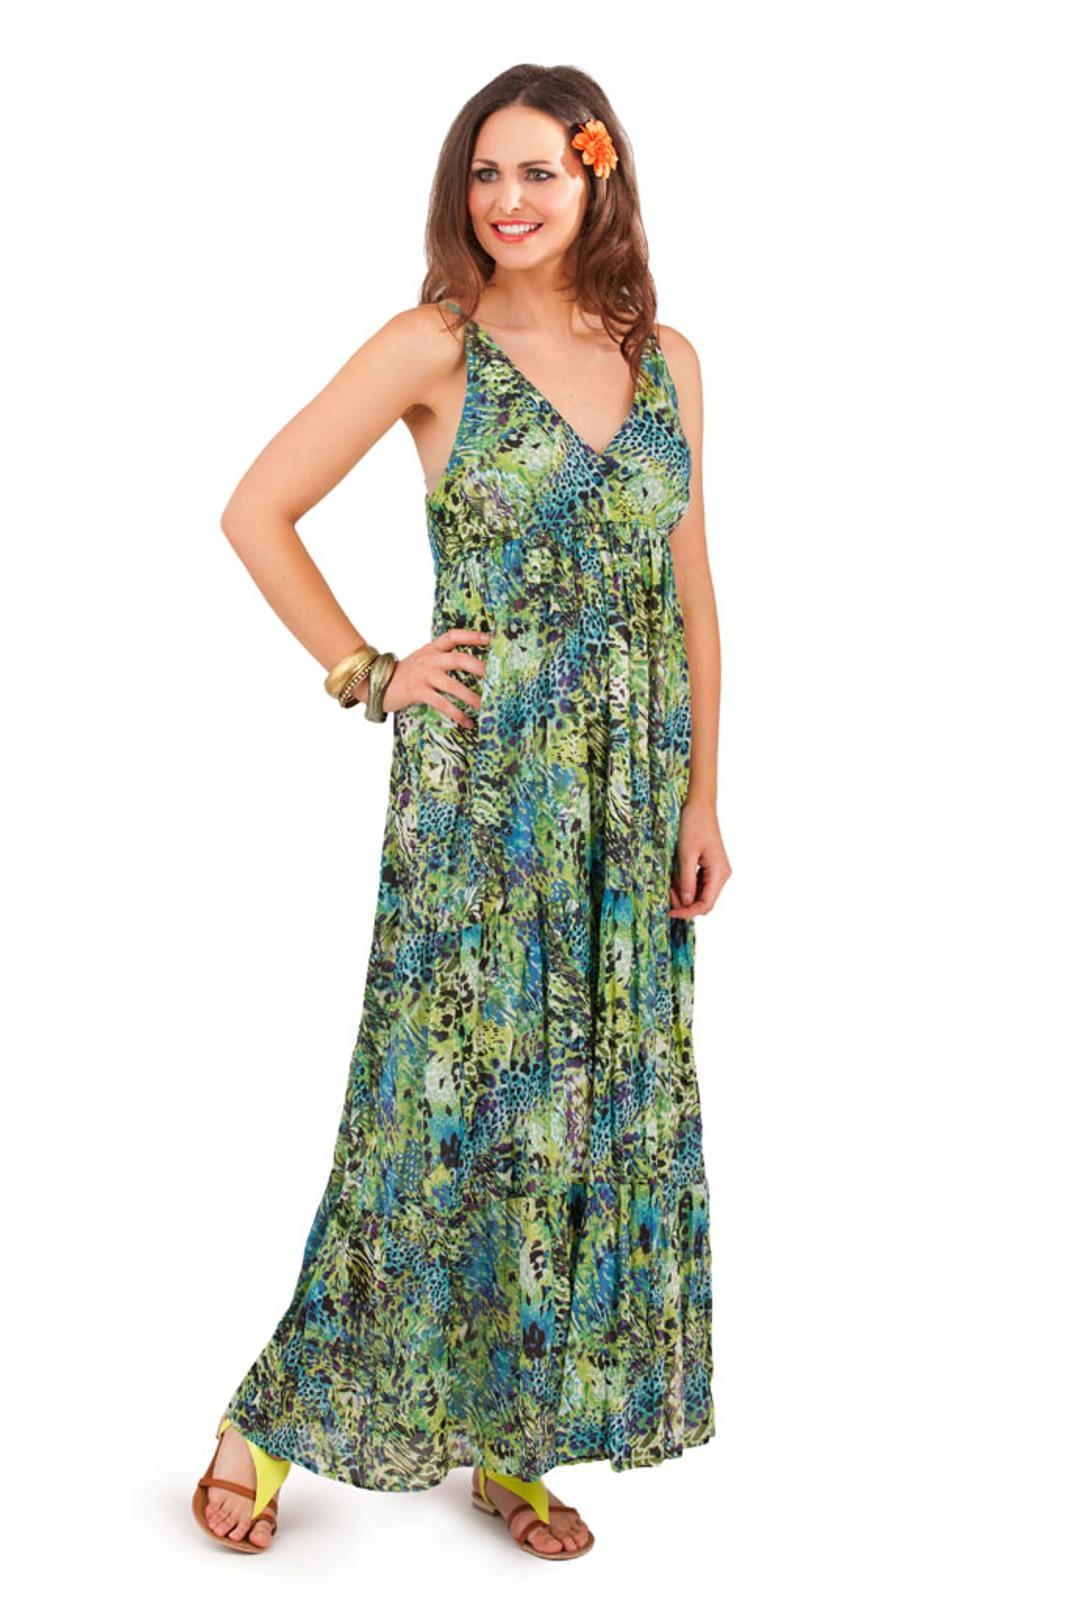 D430 GREEN womens 100% cotton flower v neck maxi full length summer dress,Ebay Womens Clothing Size 8